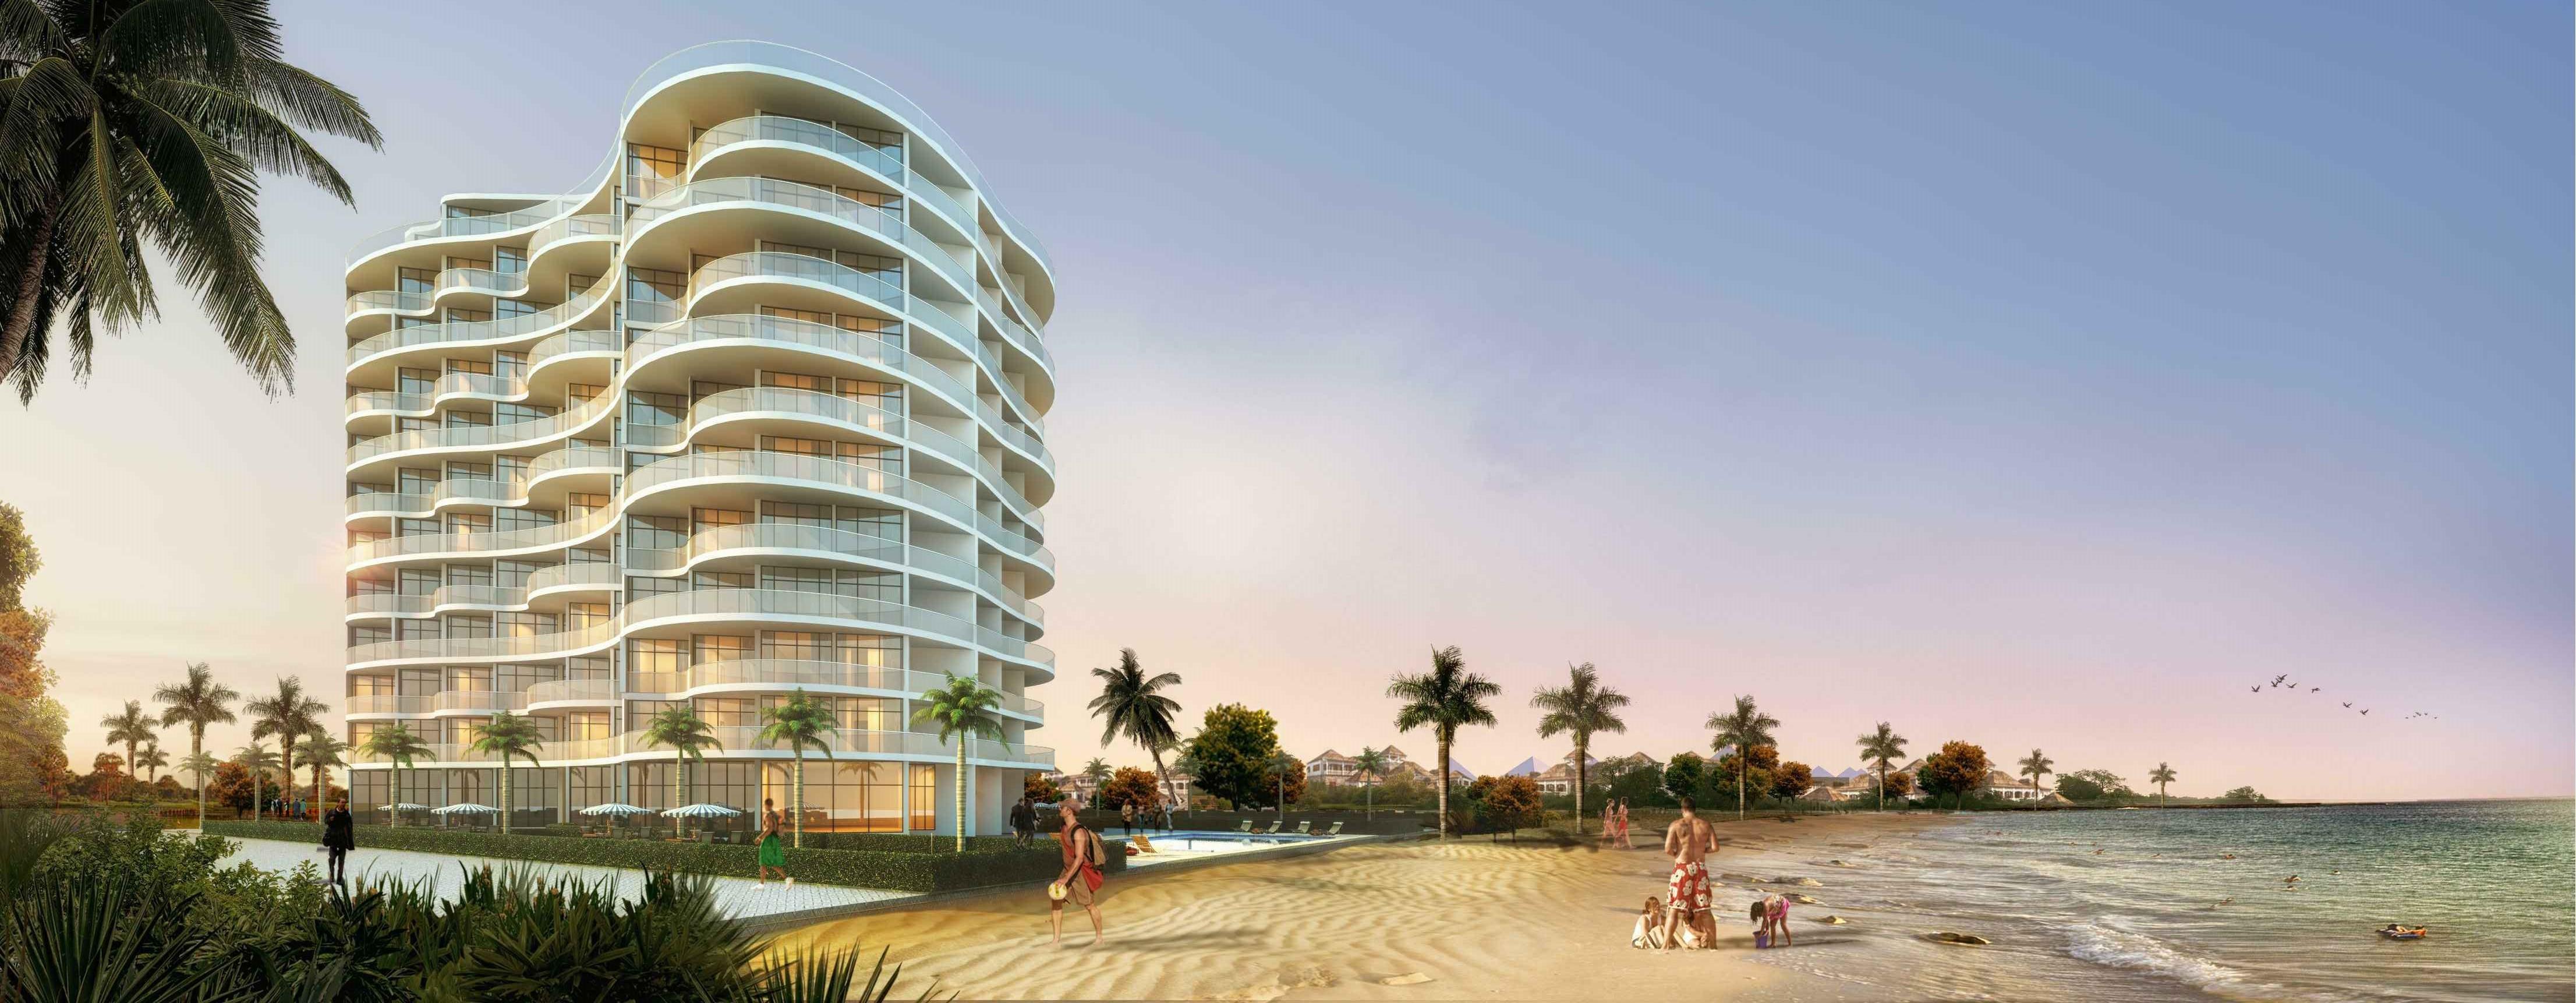 Palm Jumeirah Hotel Apartment